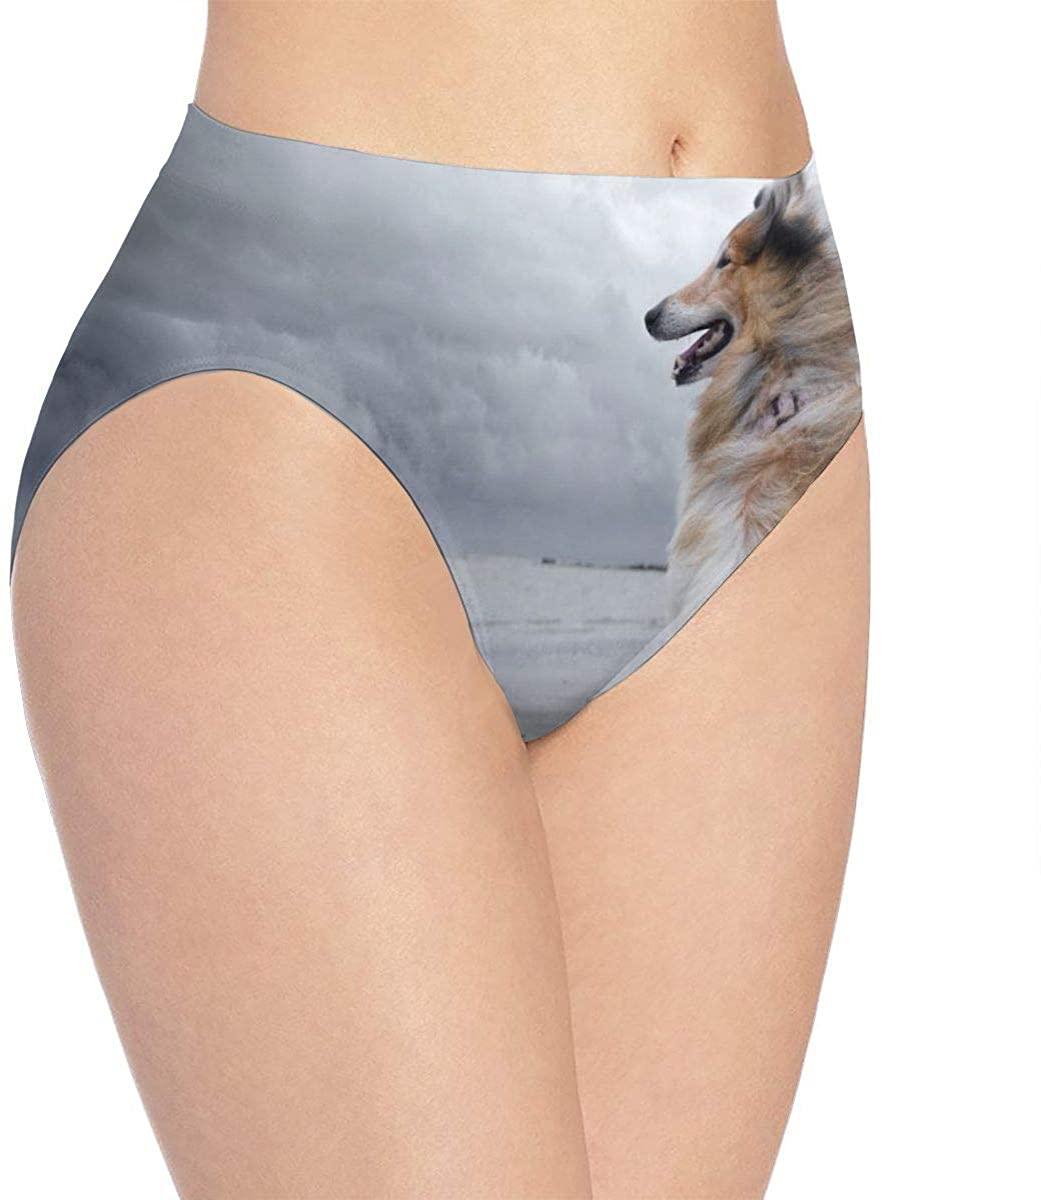 Loveful Personalized Shetland Sheepdog Dog Womens Stretch Seamless Underwear Laser Cut Brief Panties